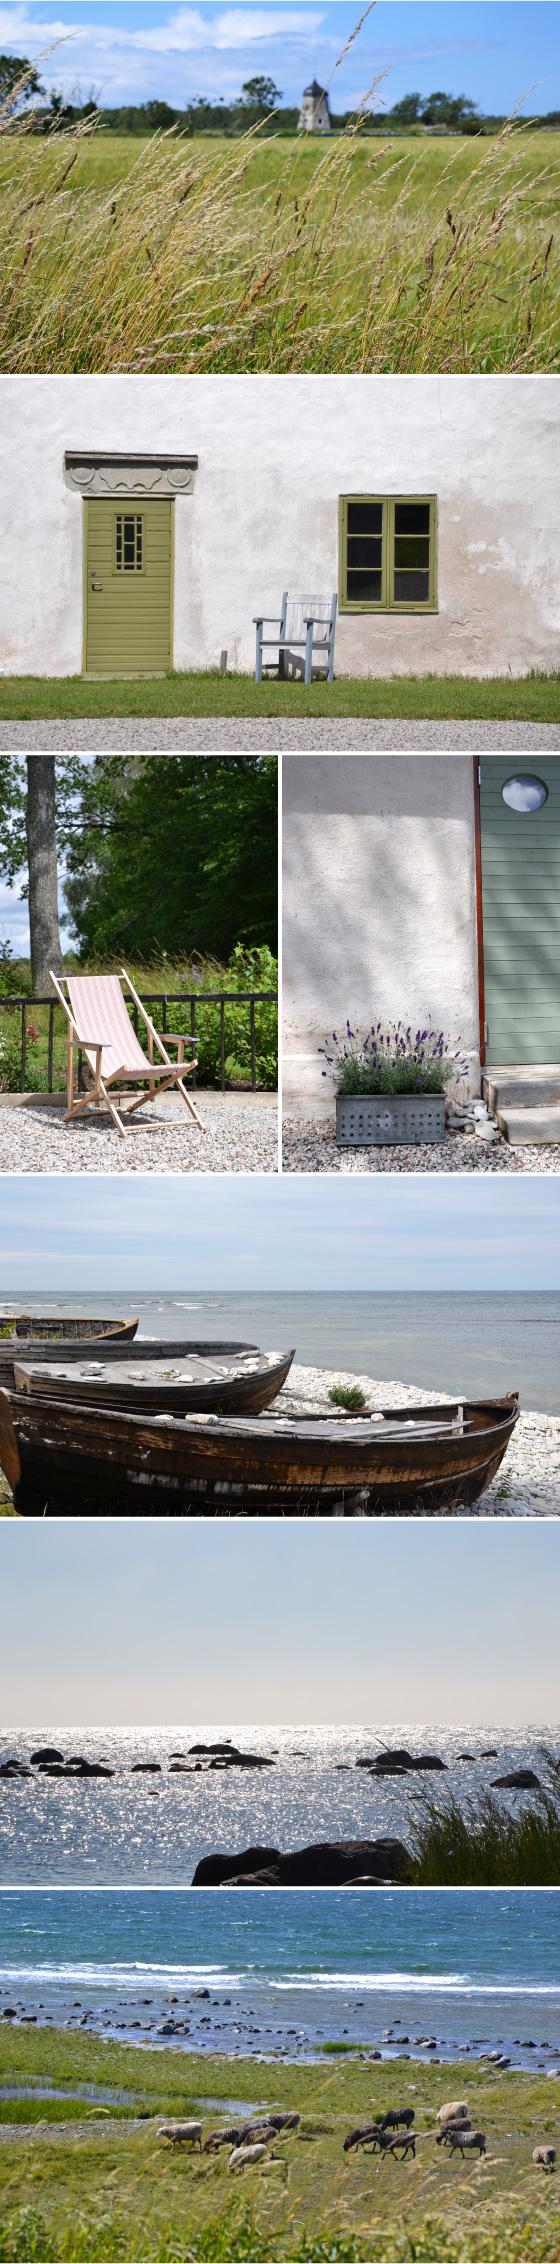 Gotland 2012